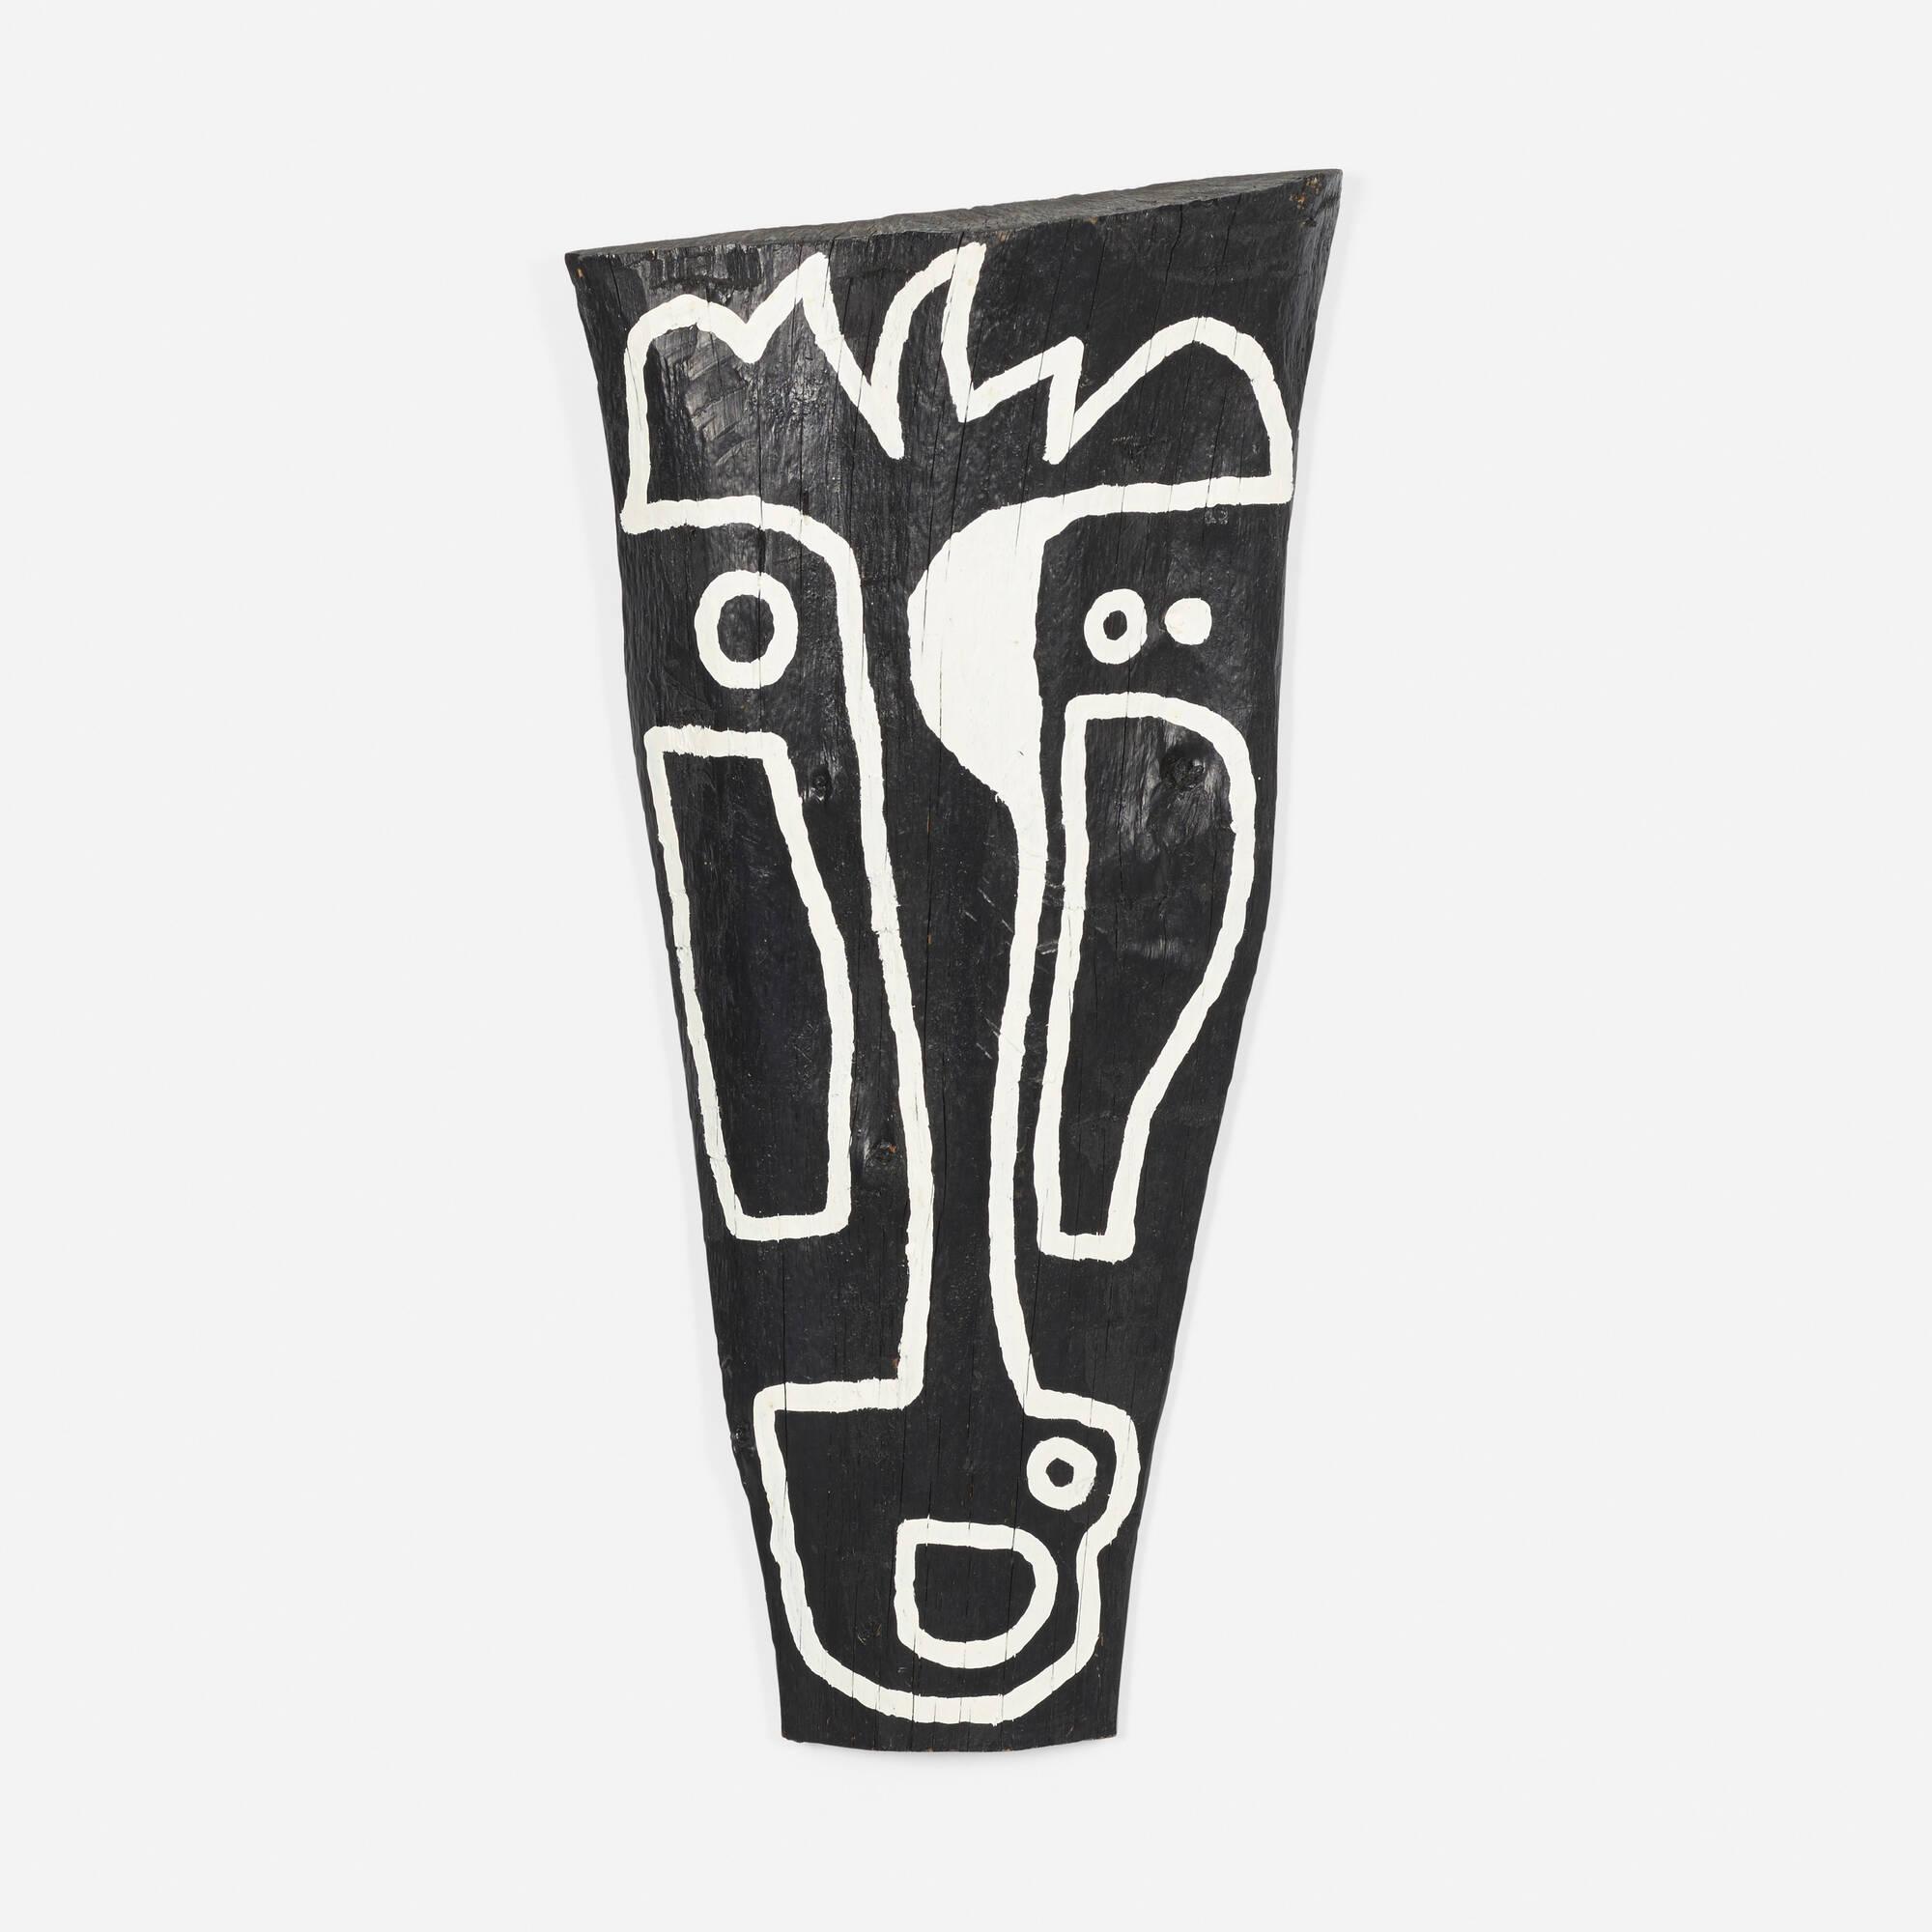 202: Arne Lindaas / Untitled (1 of 2)